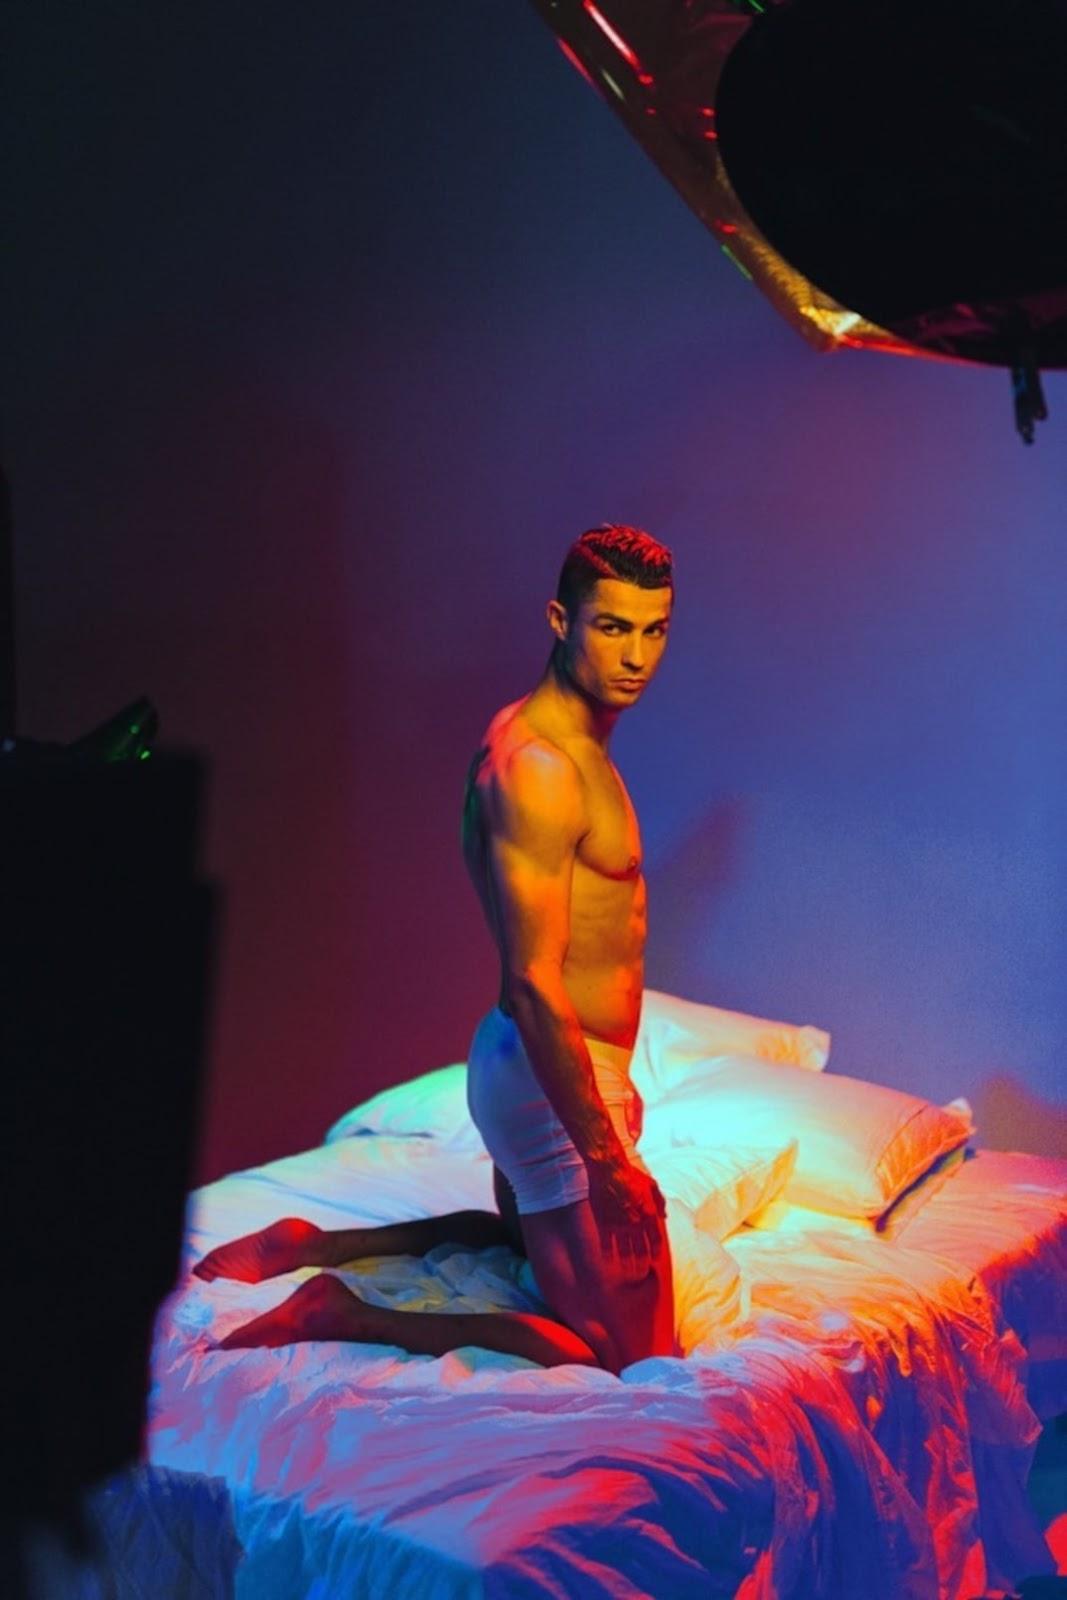 Cristiano Ronaldo X Cuneyt Akeroglu X CR7 Underwear